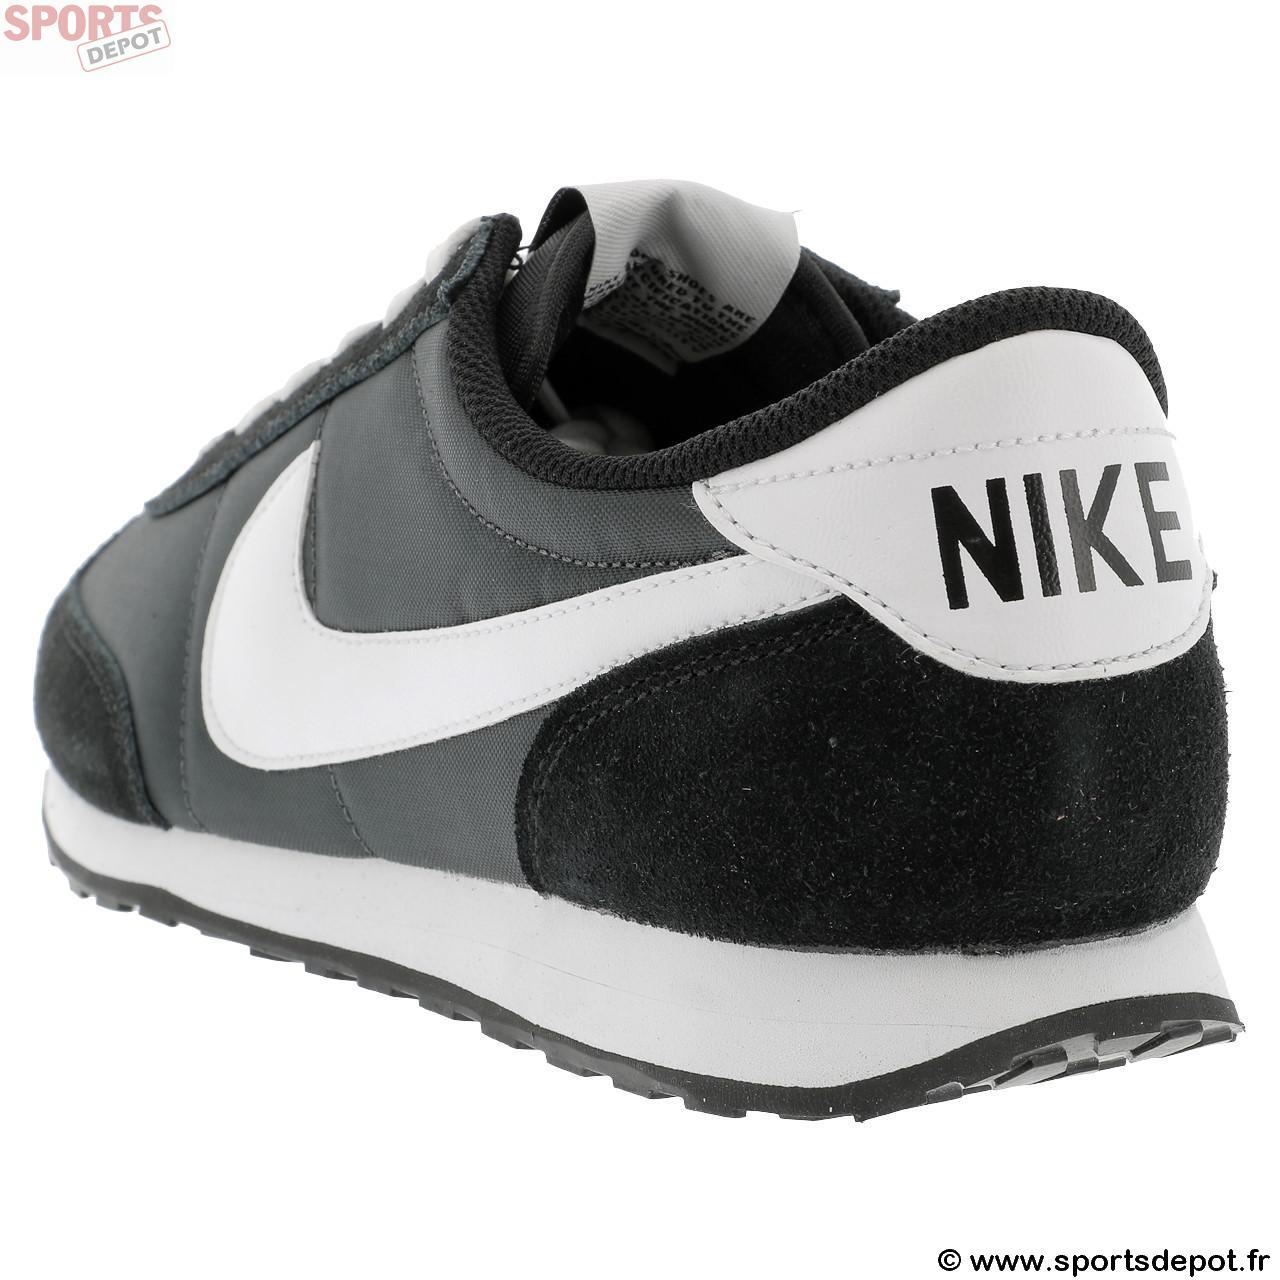 Nike Match Homme Chaussures Mode Running Acheter Nr Mixte Runner vqFPgxw